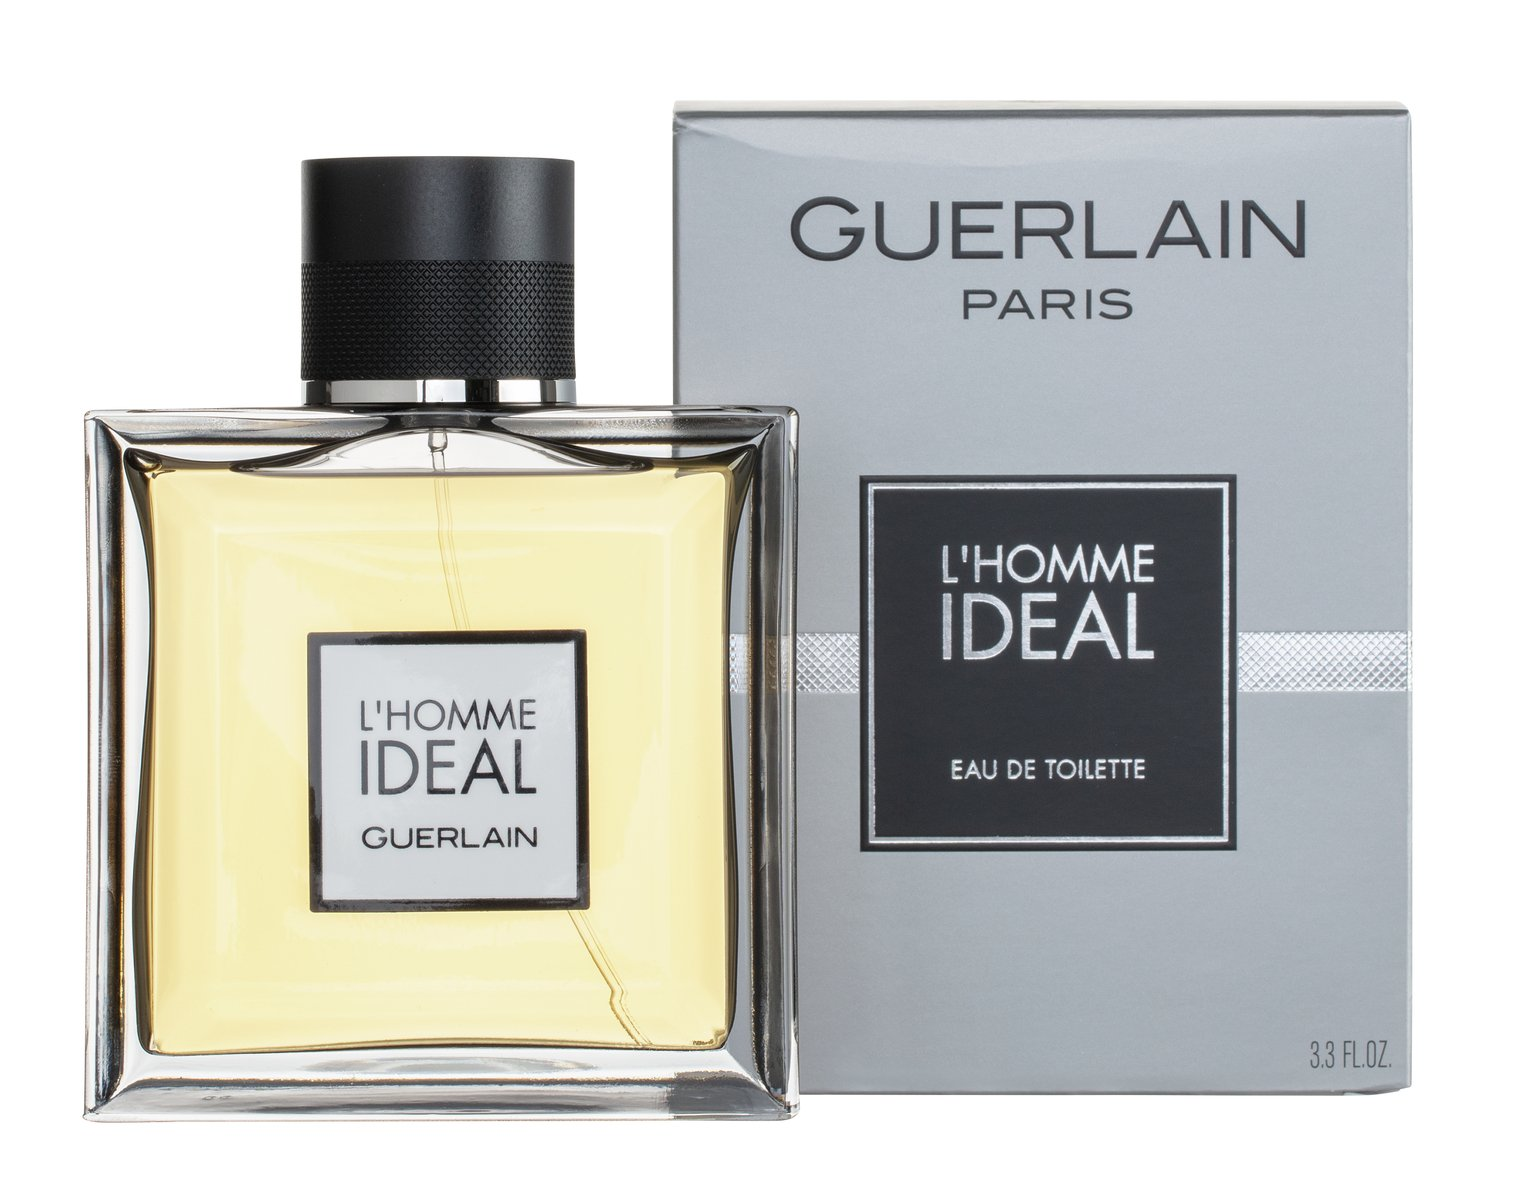 Guerlain L'Homme Ideal - 100ml